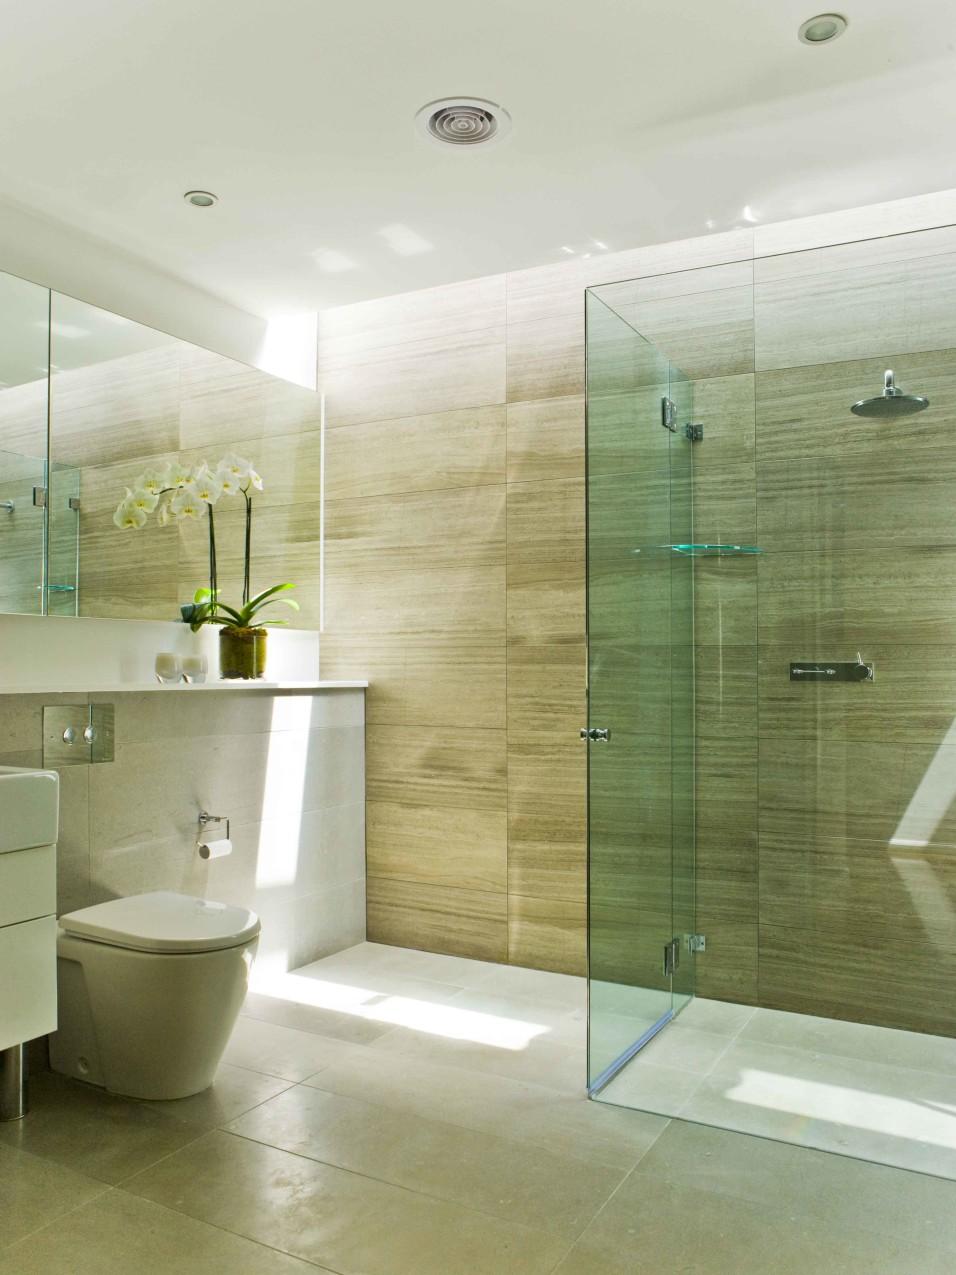 Andrew-Waller-Design-Balmain-08-Marble-wall